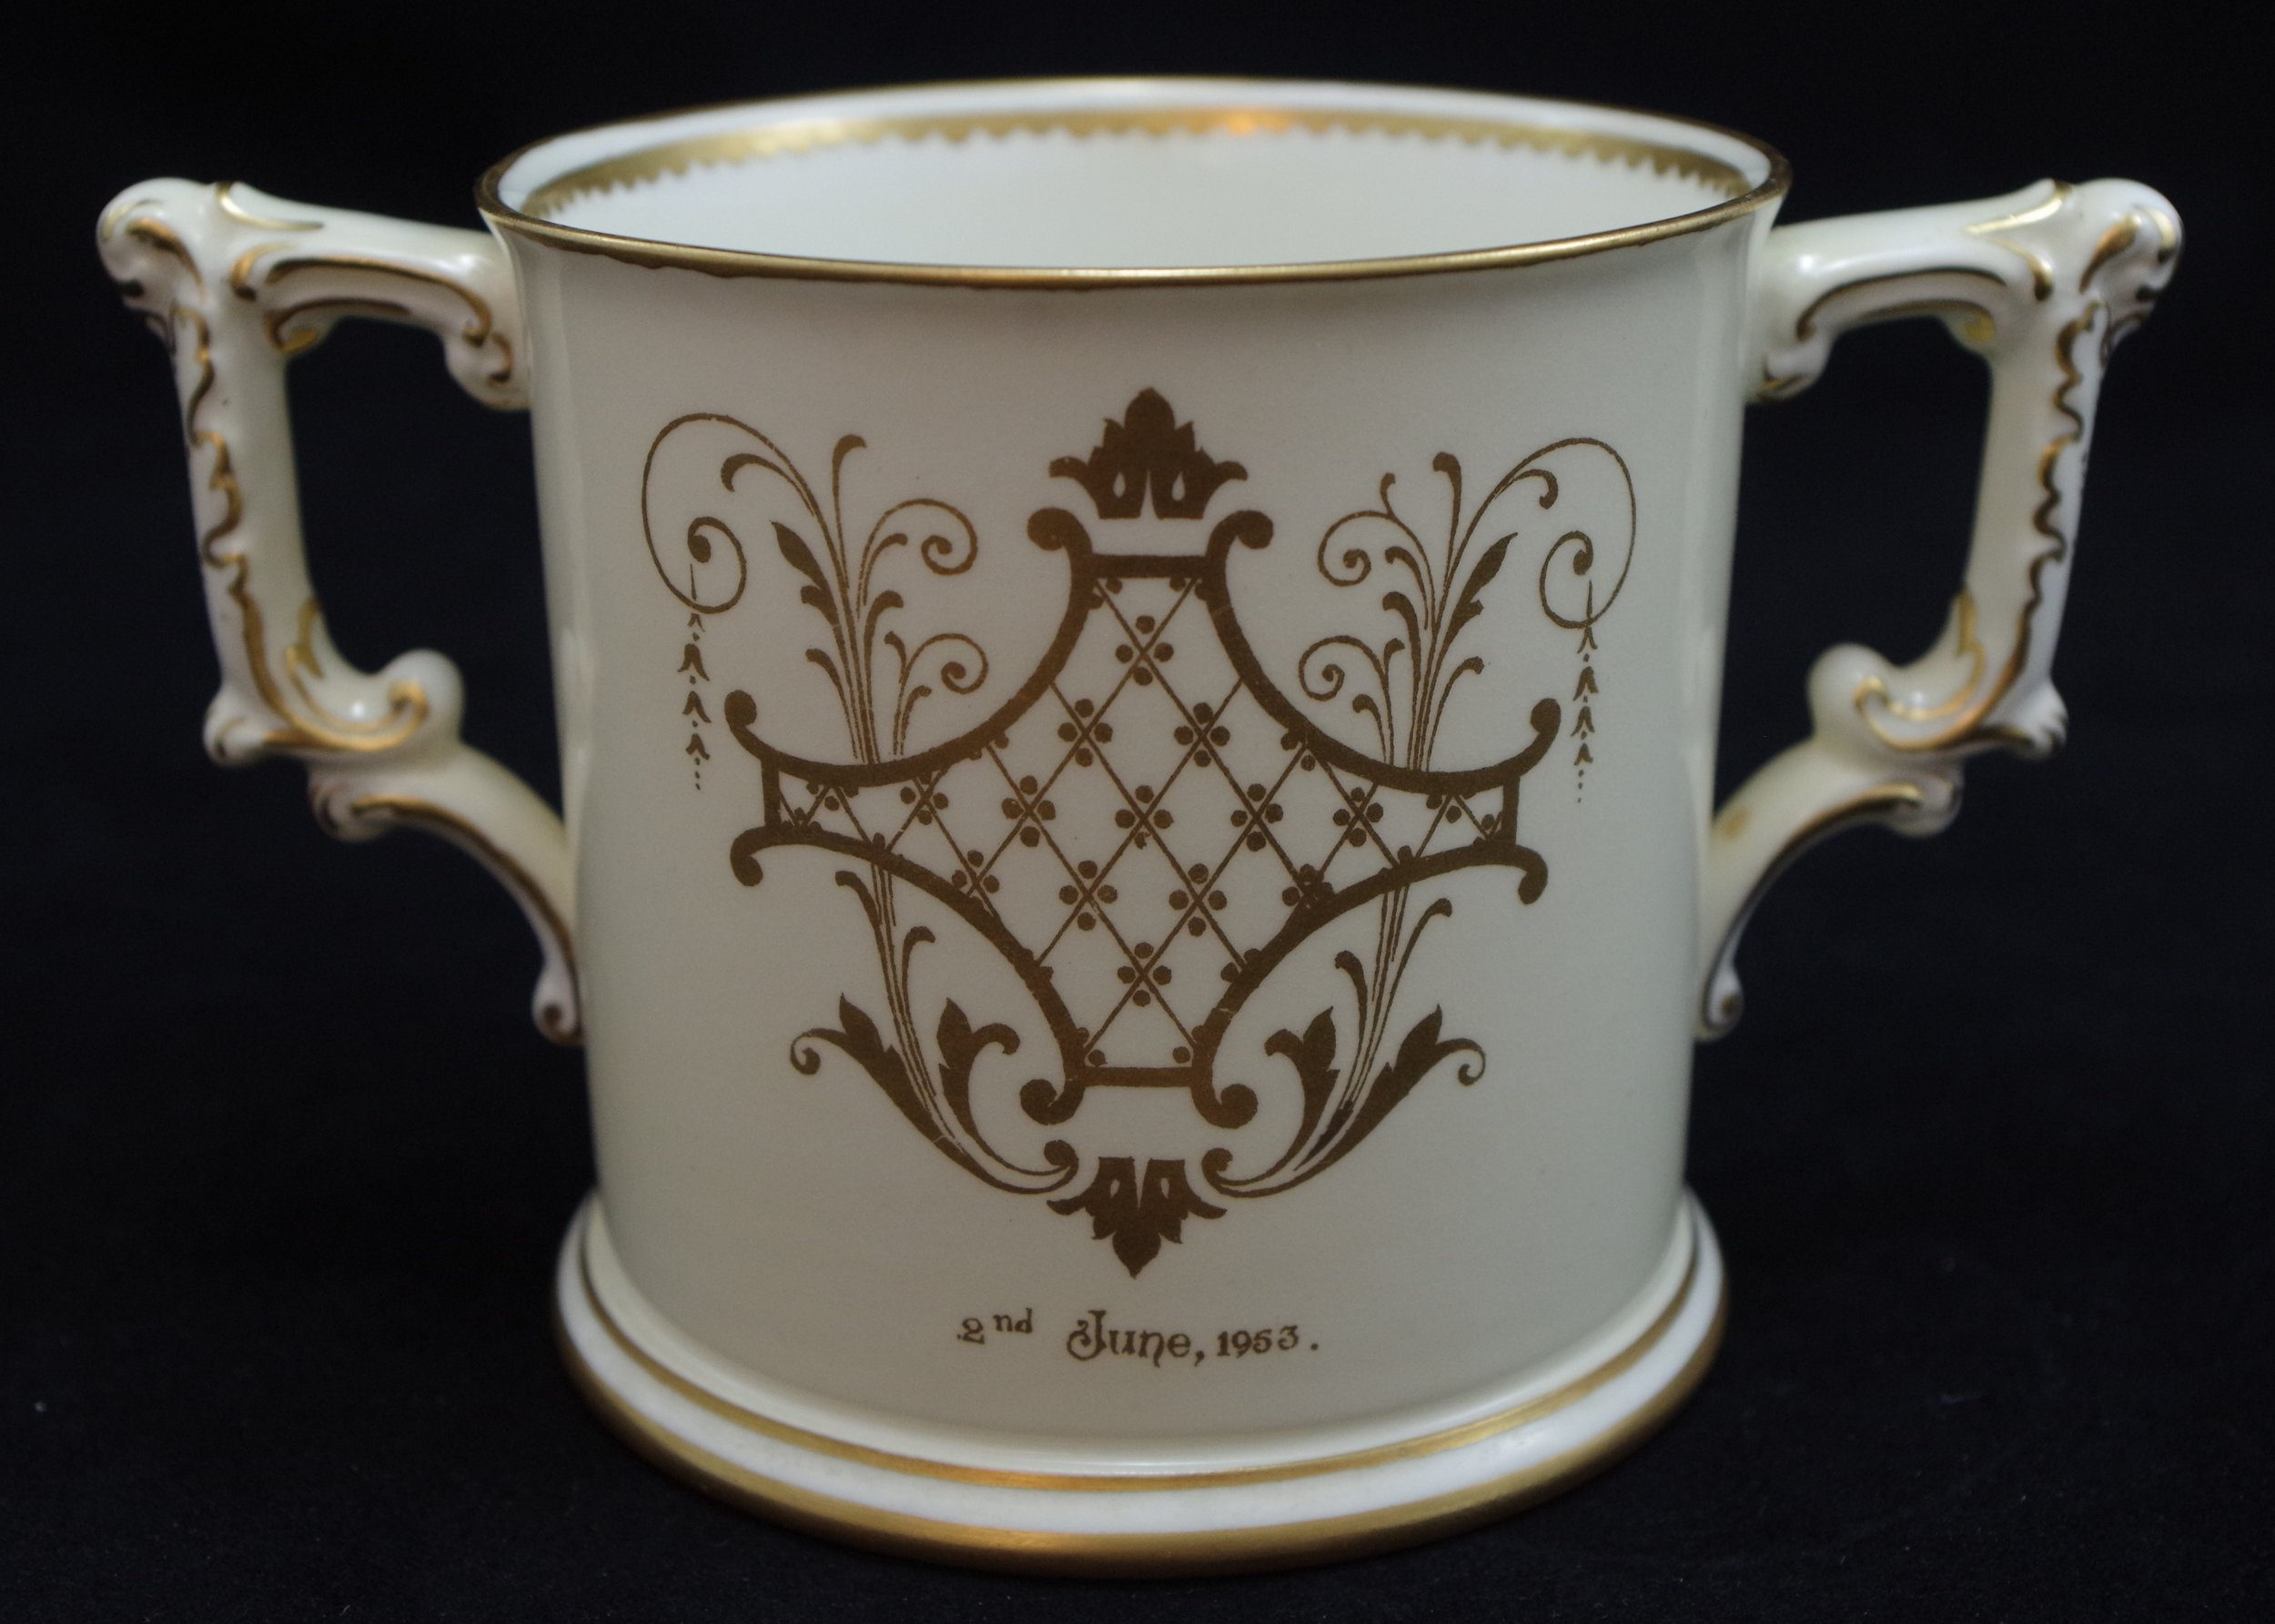 royal-crown-derby-elizabeth-II-coronation-limited-edition-loving-cup-reverse-1953